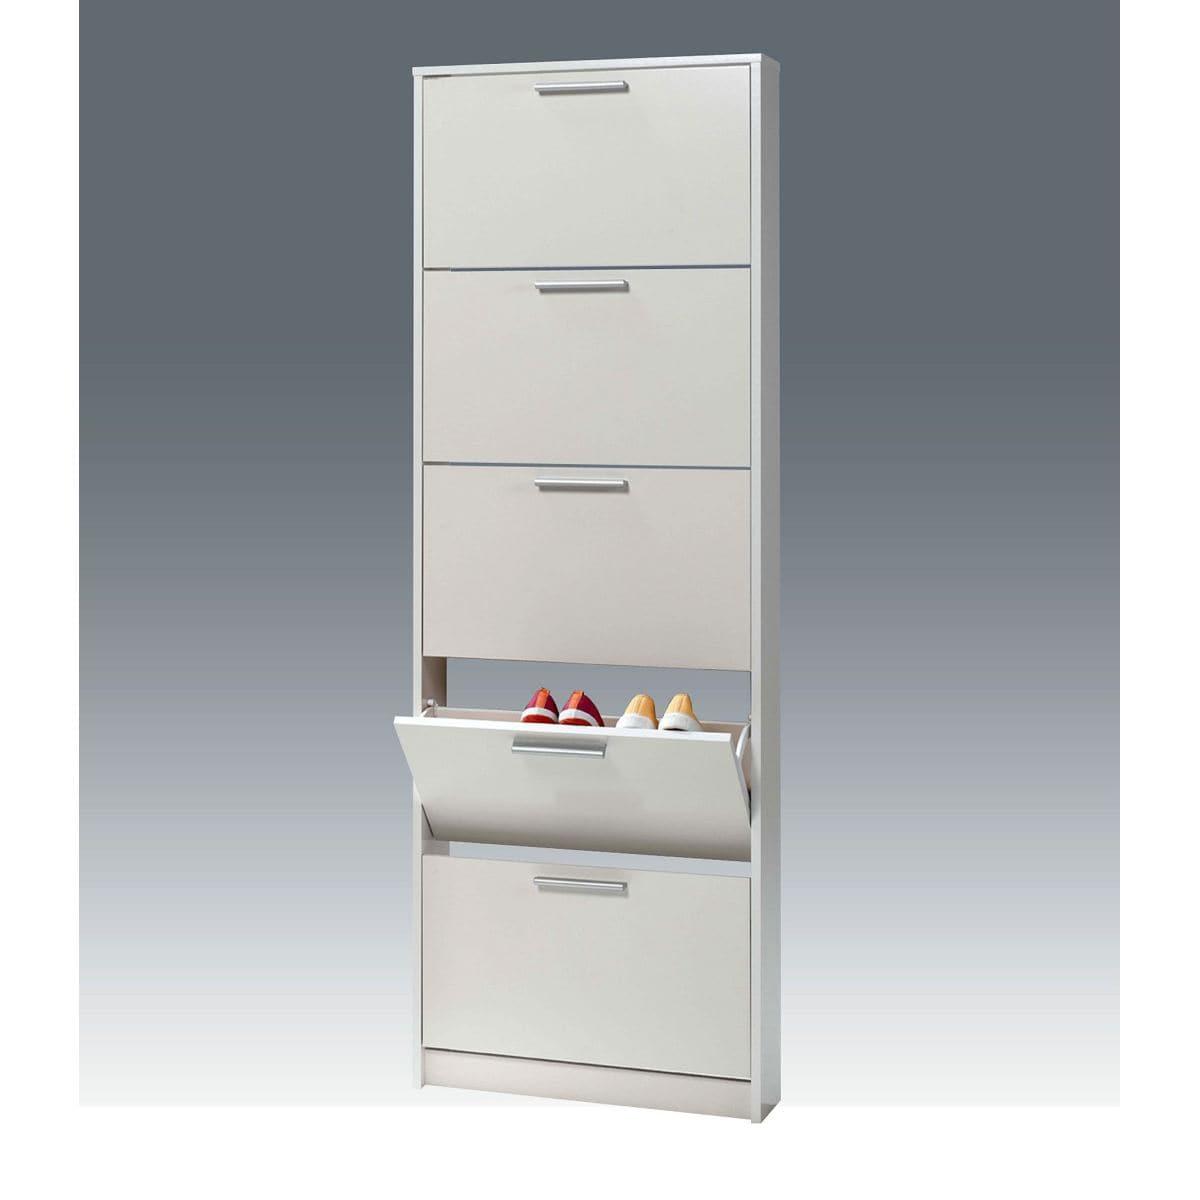 schuhschrank mini in wei porta porta m bel. Black Bedroom Furniture Sets. Home Design Ideas